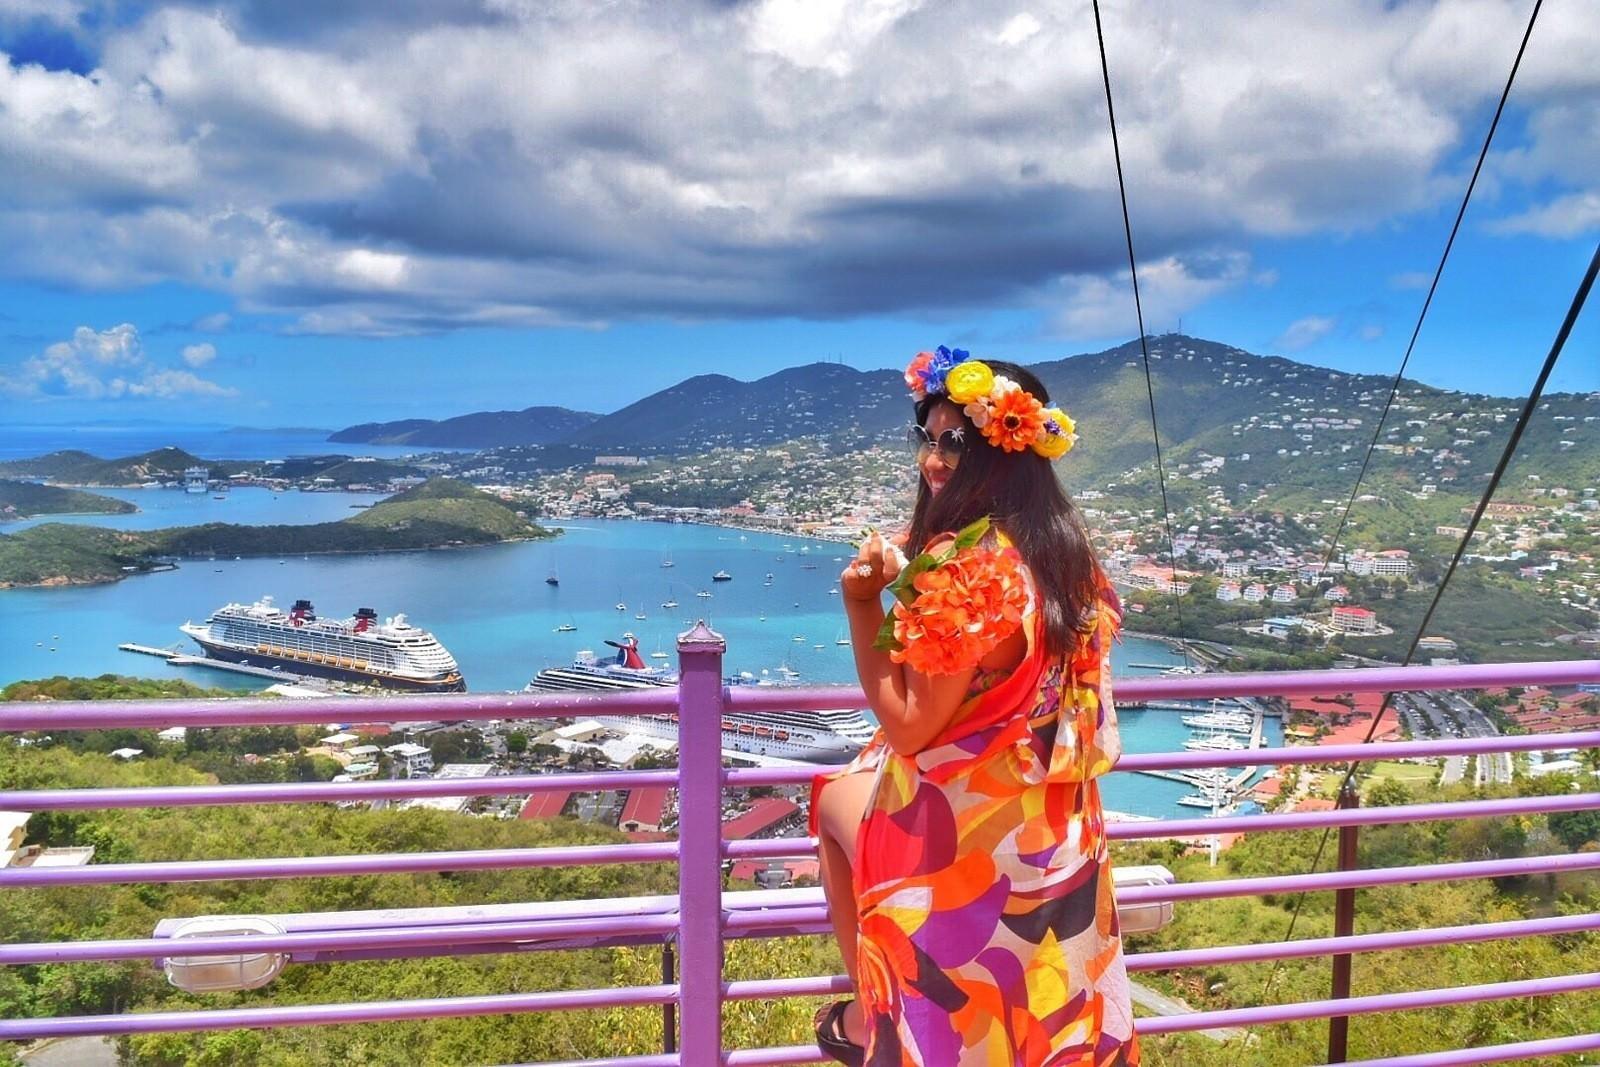 US Virgin Islands - Carnival Splendor Cruise -Caribbean Trip Kach and Jonathan